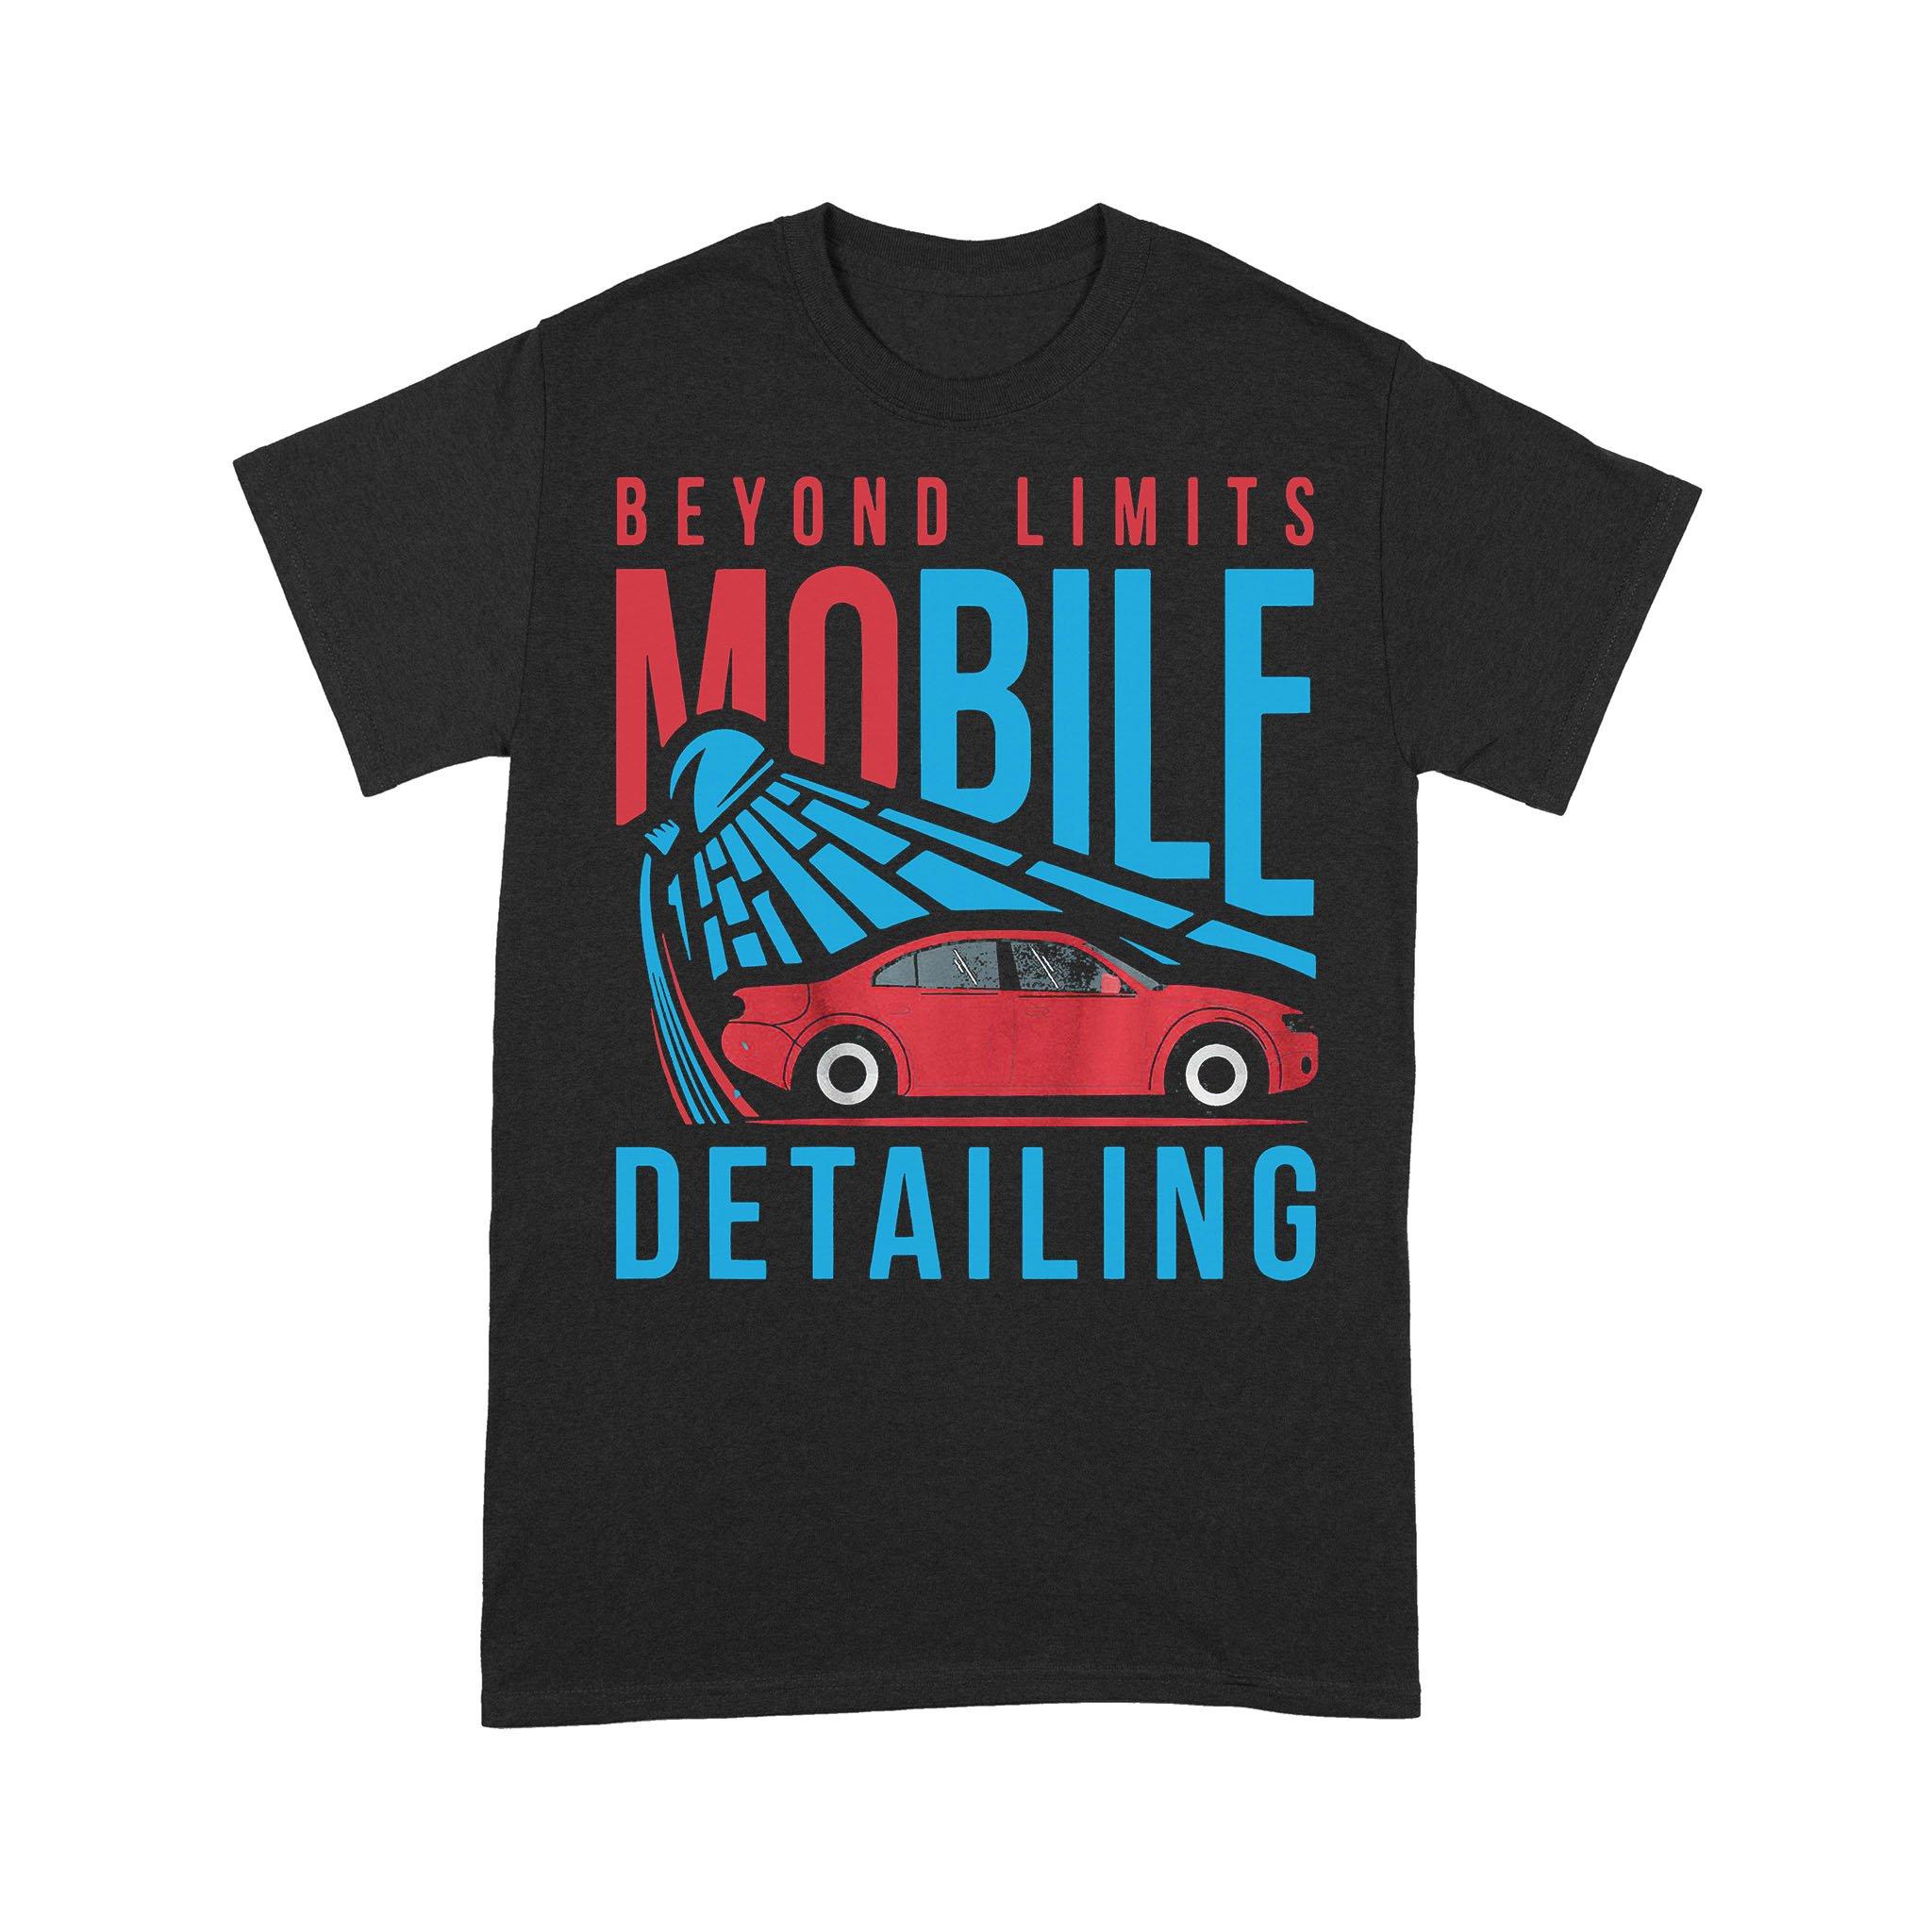 Beyond Limits Mobile Detailing T-shirt